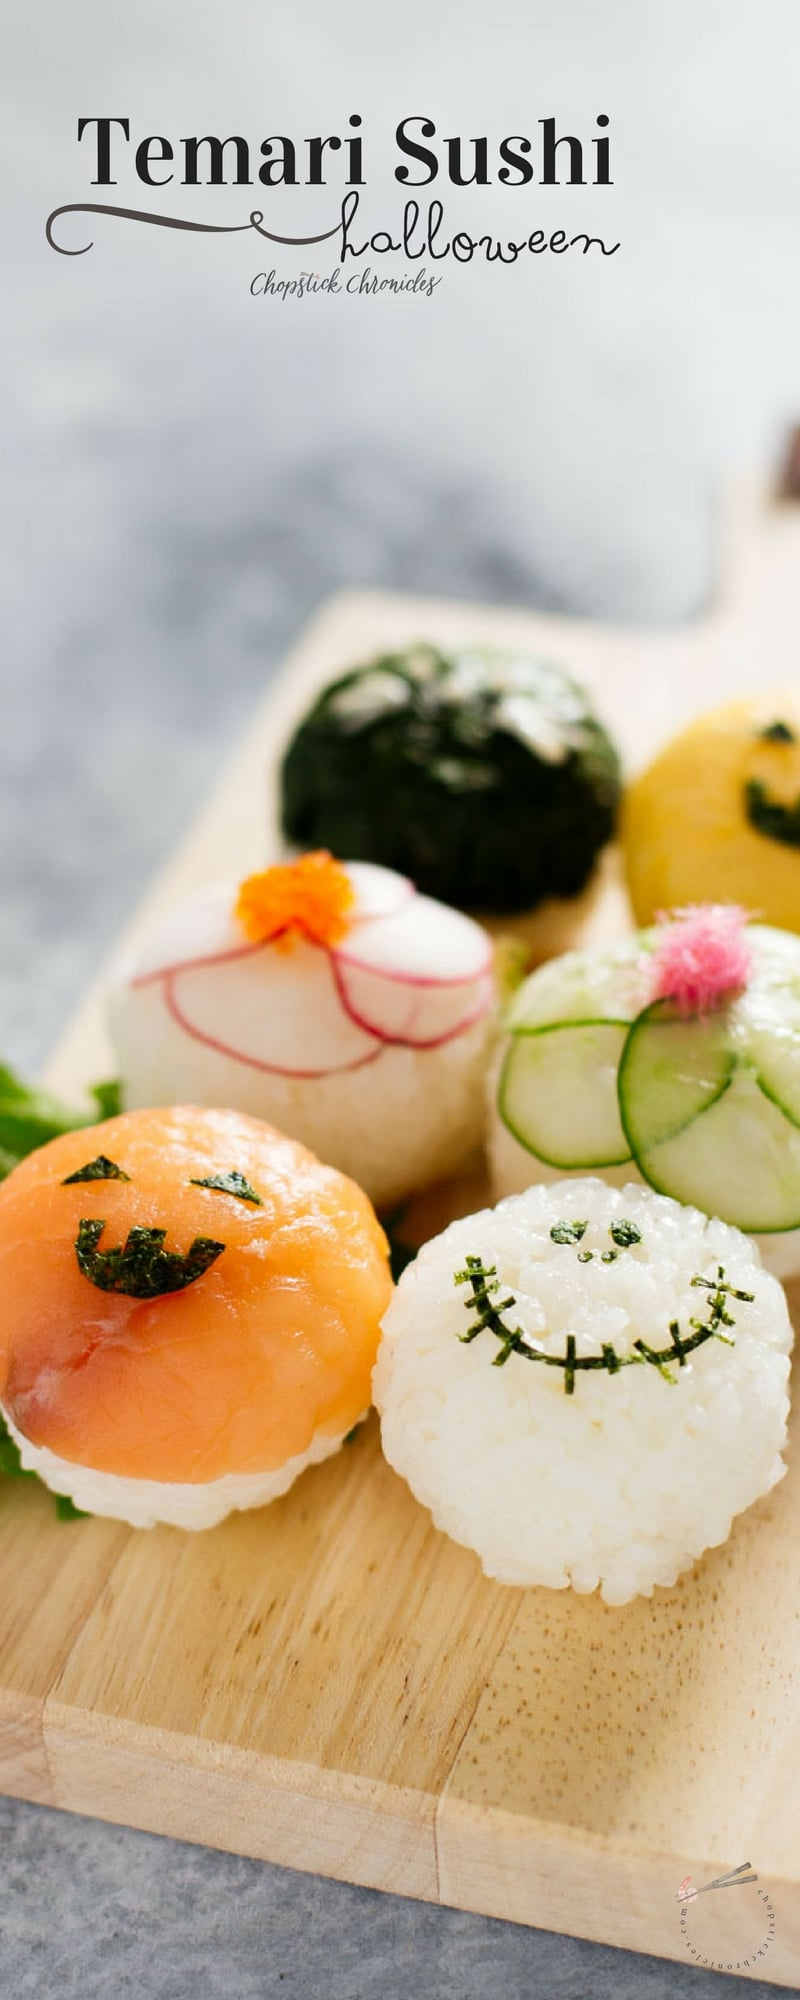 Halloween Temari Sushi for pinterest long pin